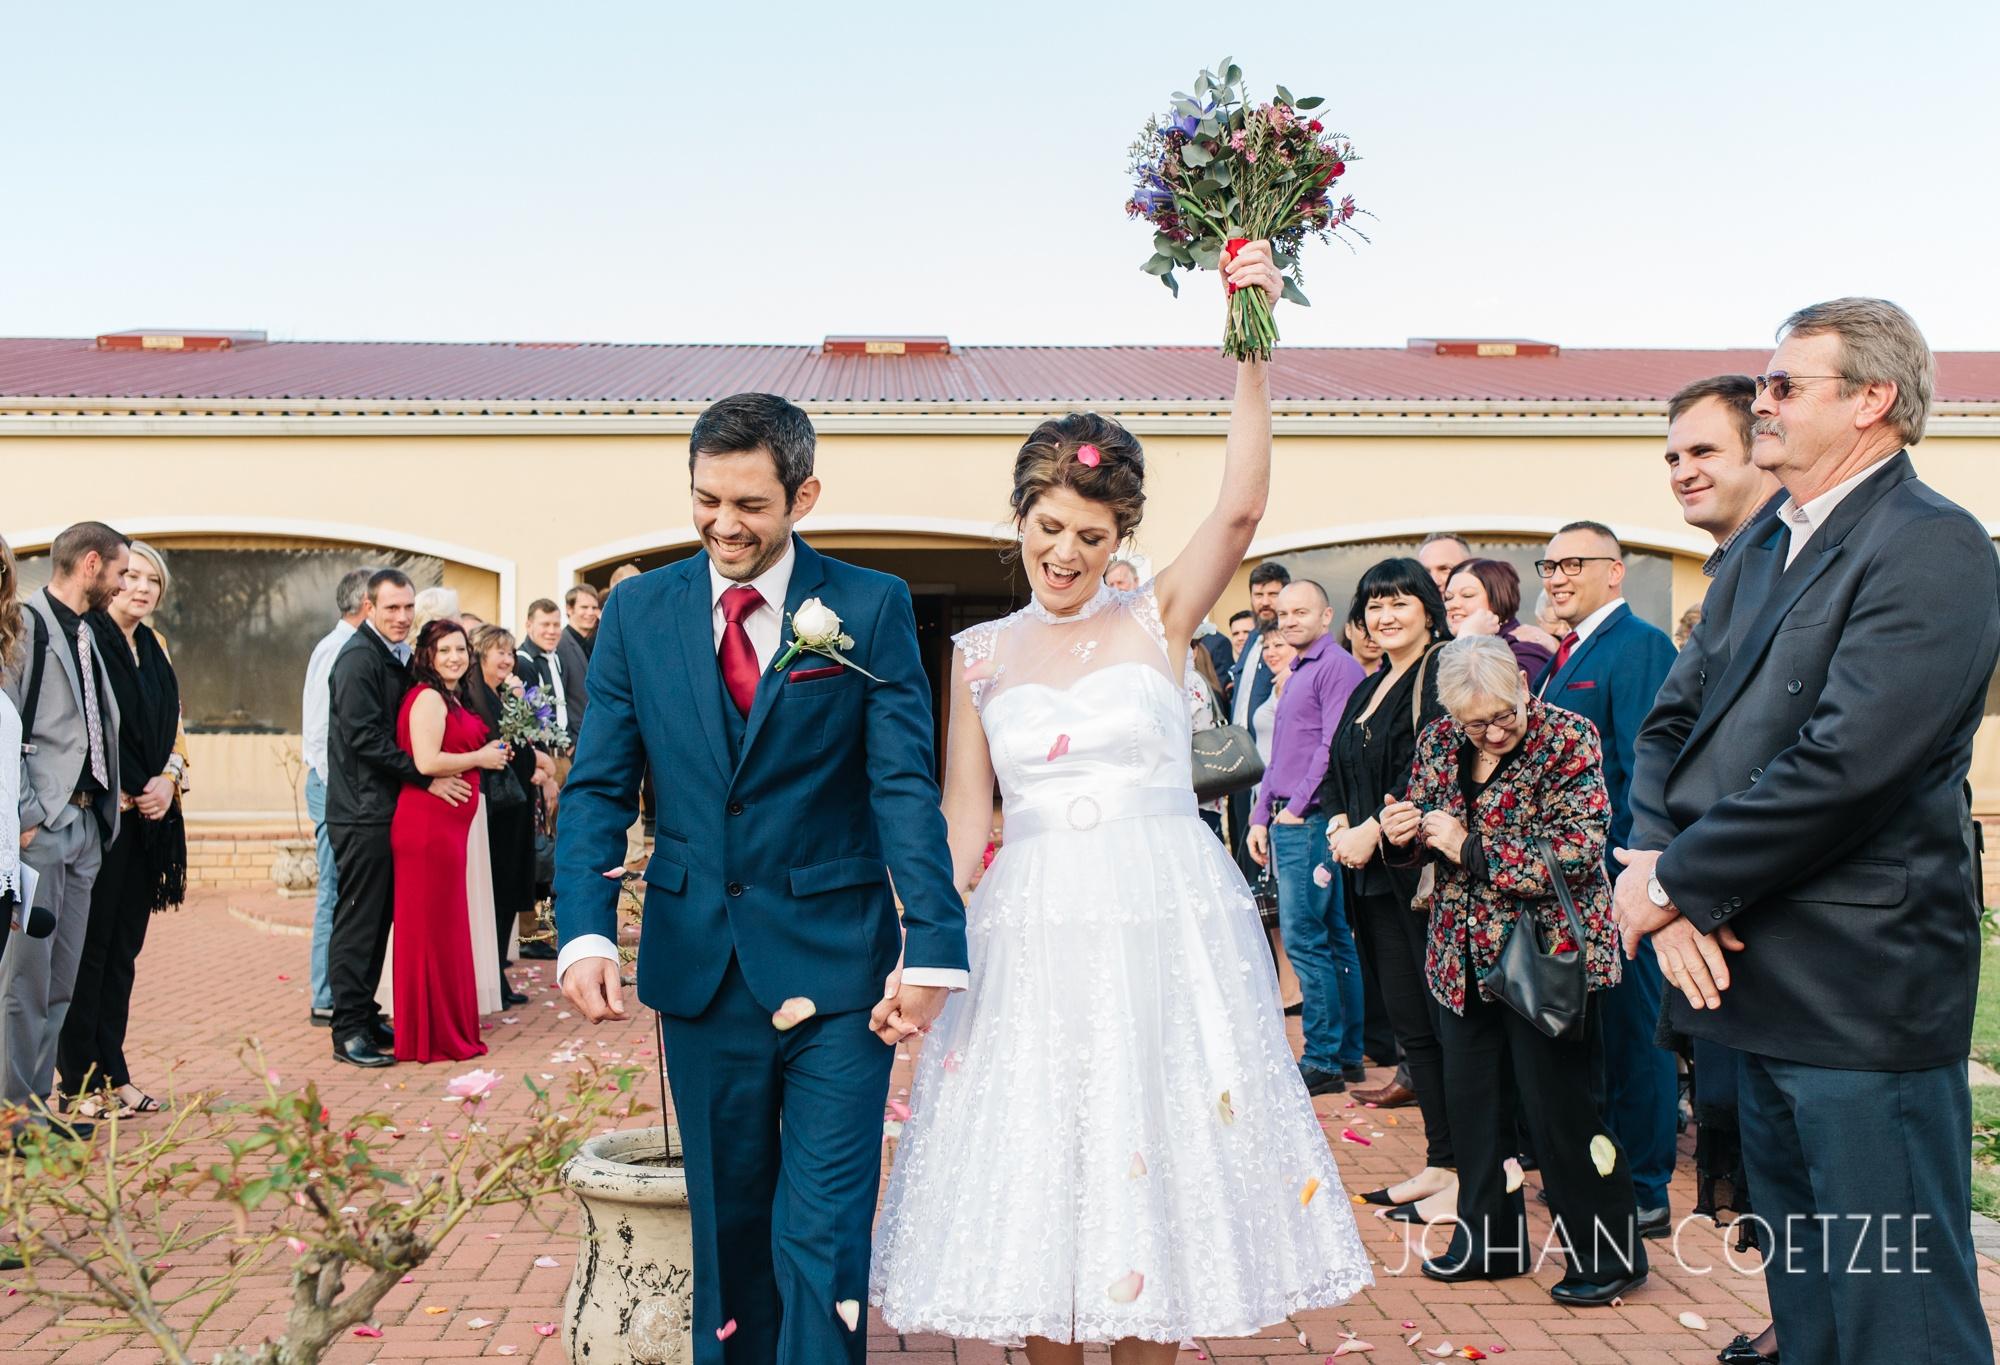 20180811_Wedding_Morgensrust_Loock_NicholasRenshia_JCP0603